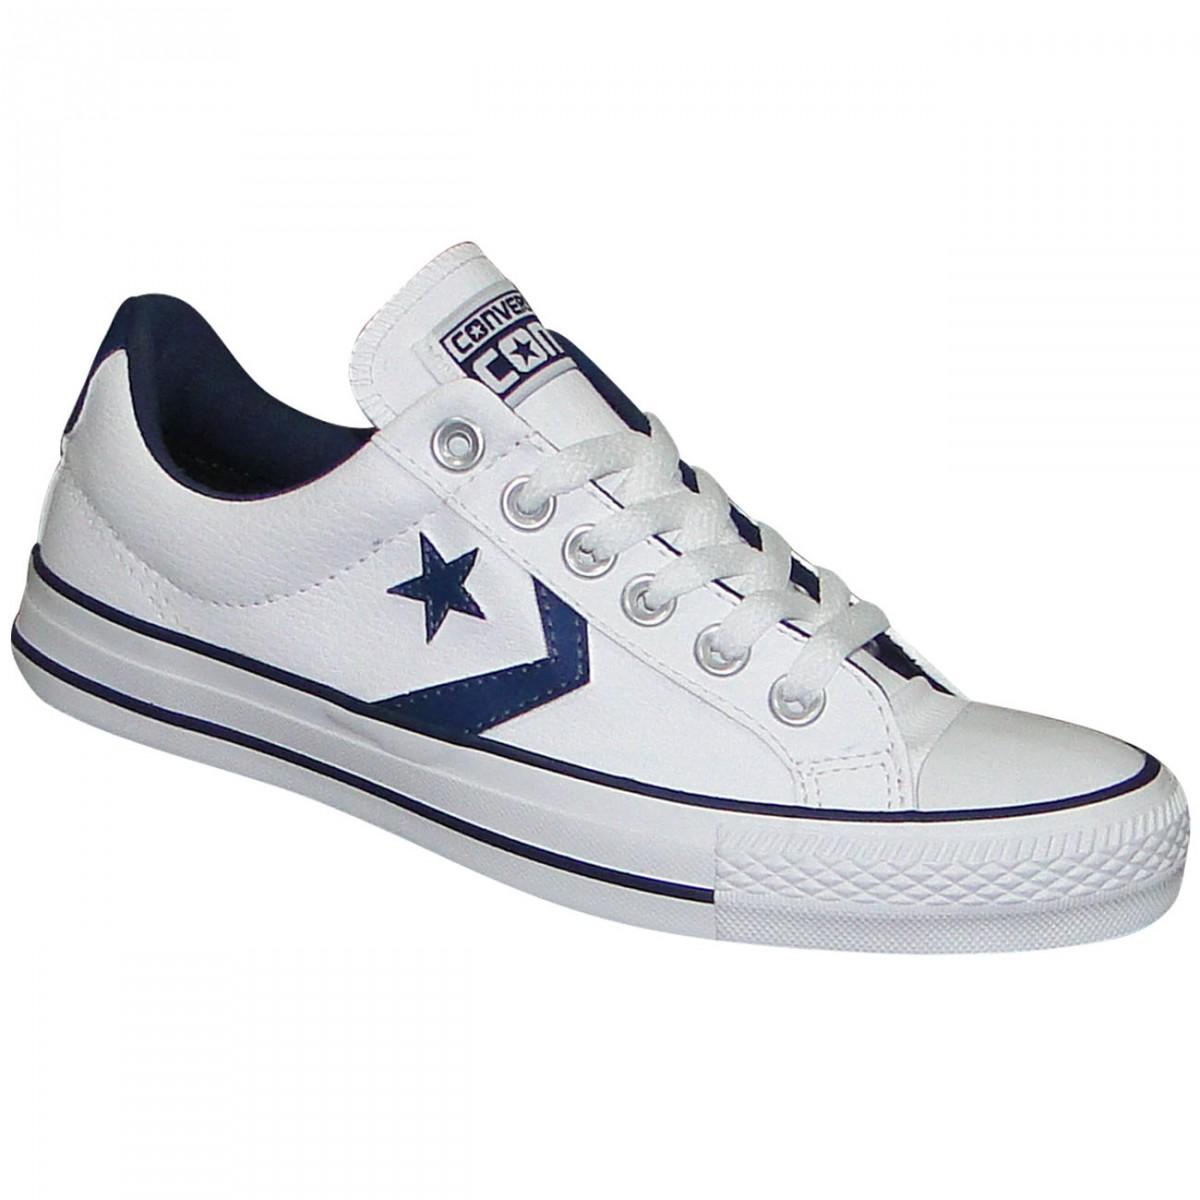 0f950cb08ce Tênis All Star Converse Star Player CO219161 - Branco Marinho - Chuteira  Nike